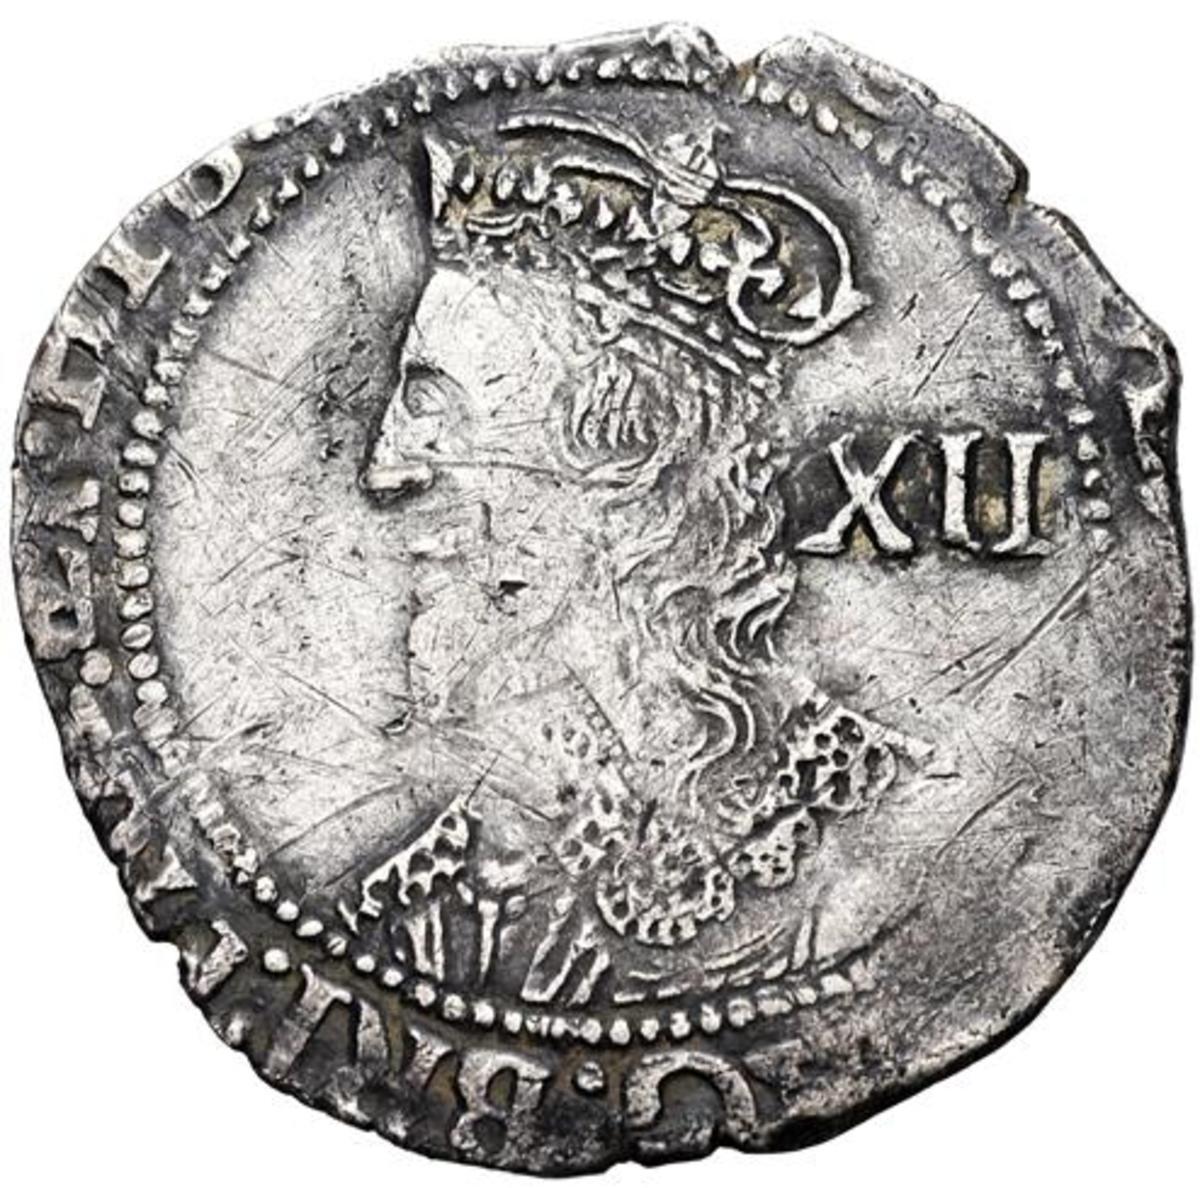 Shilling depicting Charles I